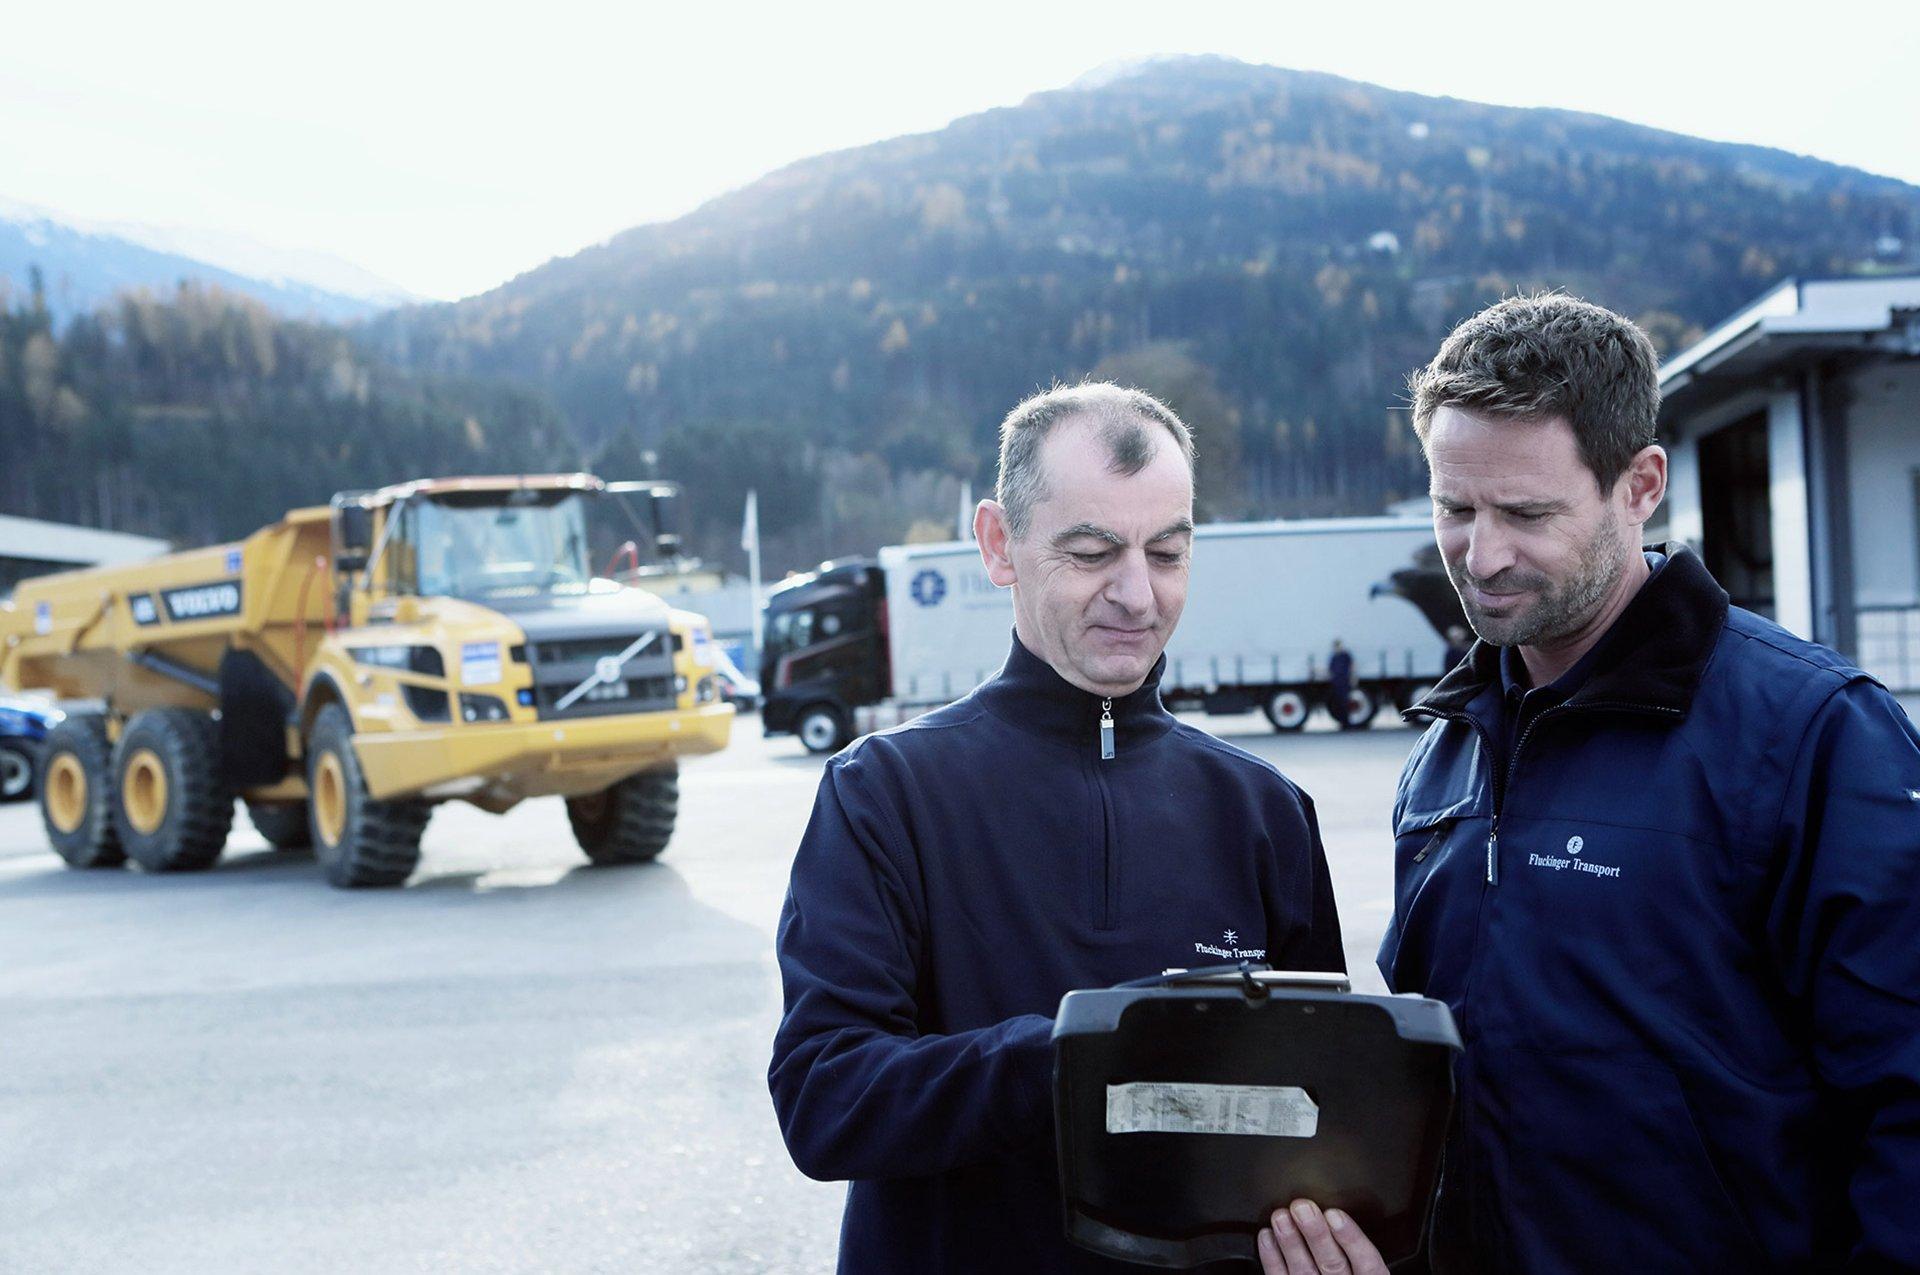 Special Cargo – Fluckinger Transport staff briefing